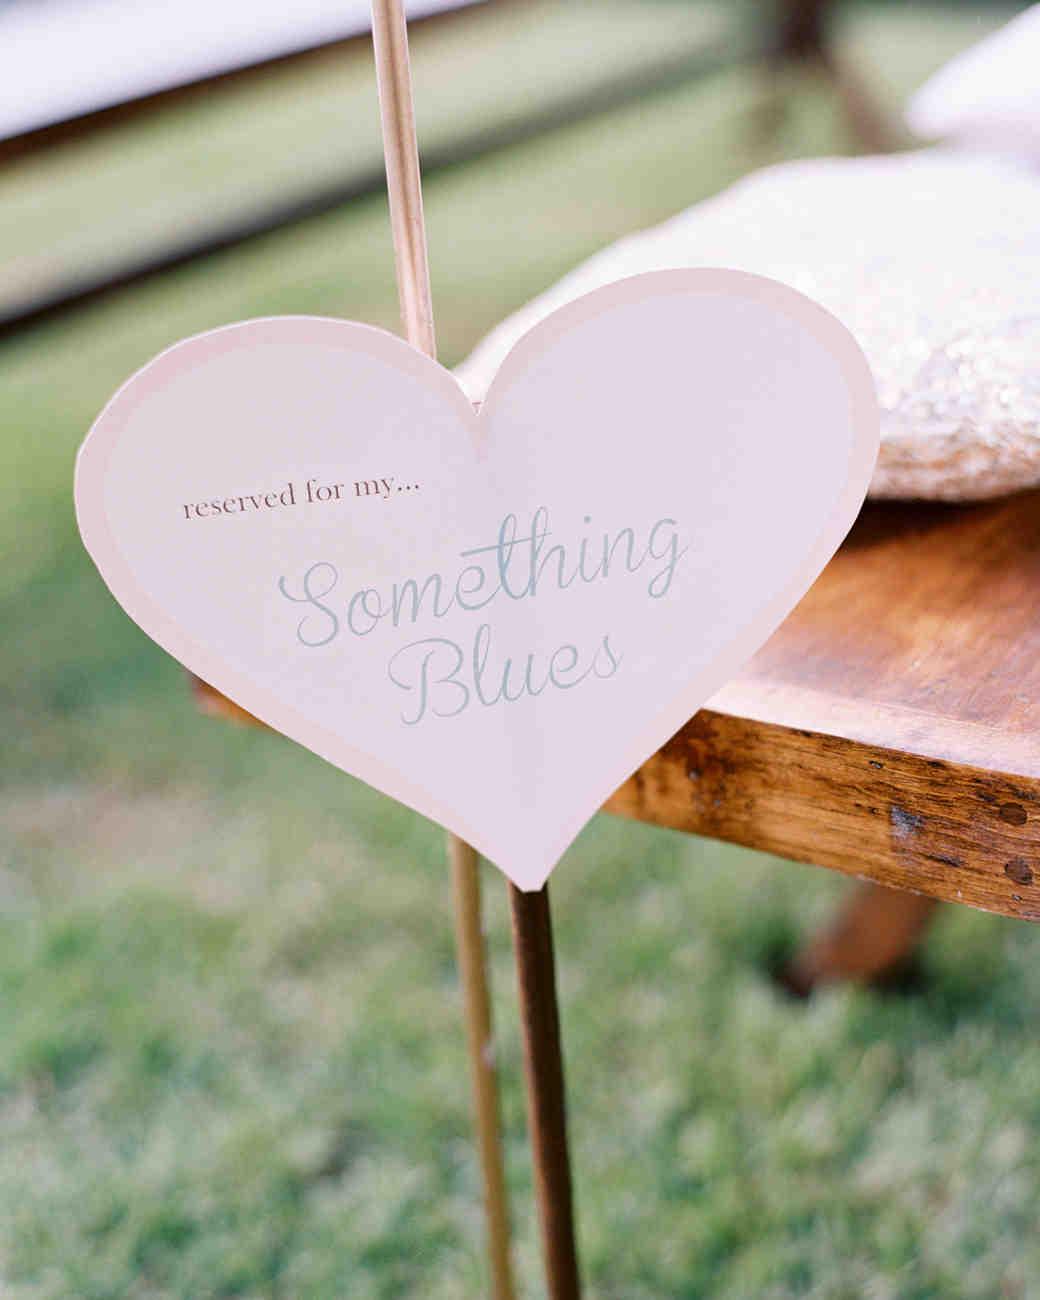 molly-nate-wedding-somethingblue-054-s111479-0814.jpg